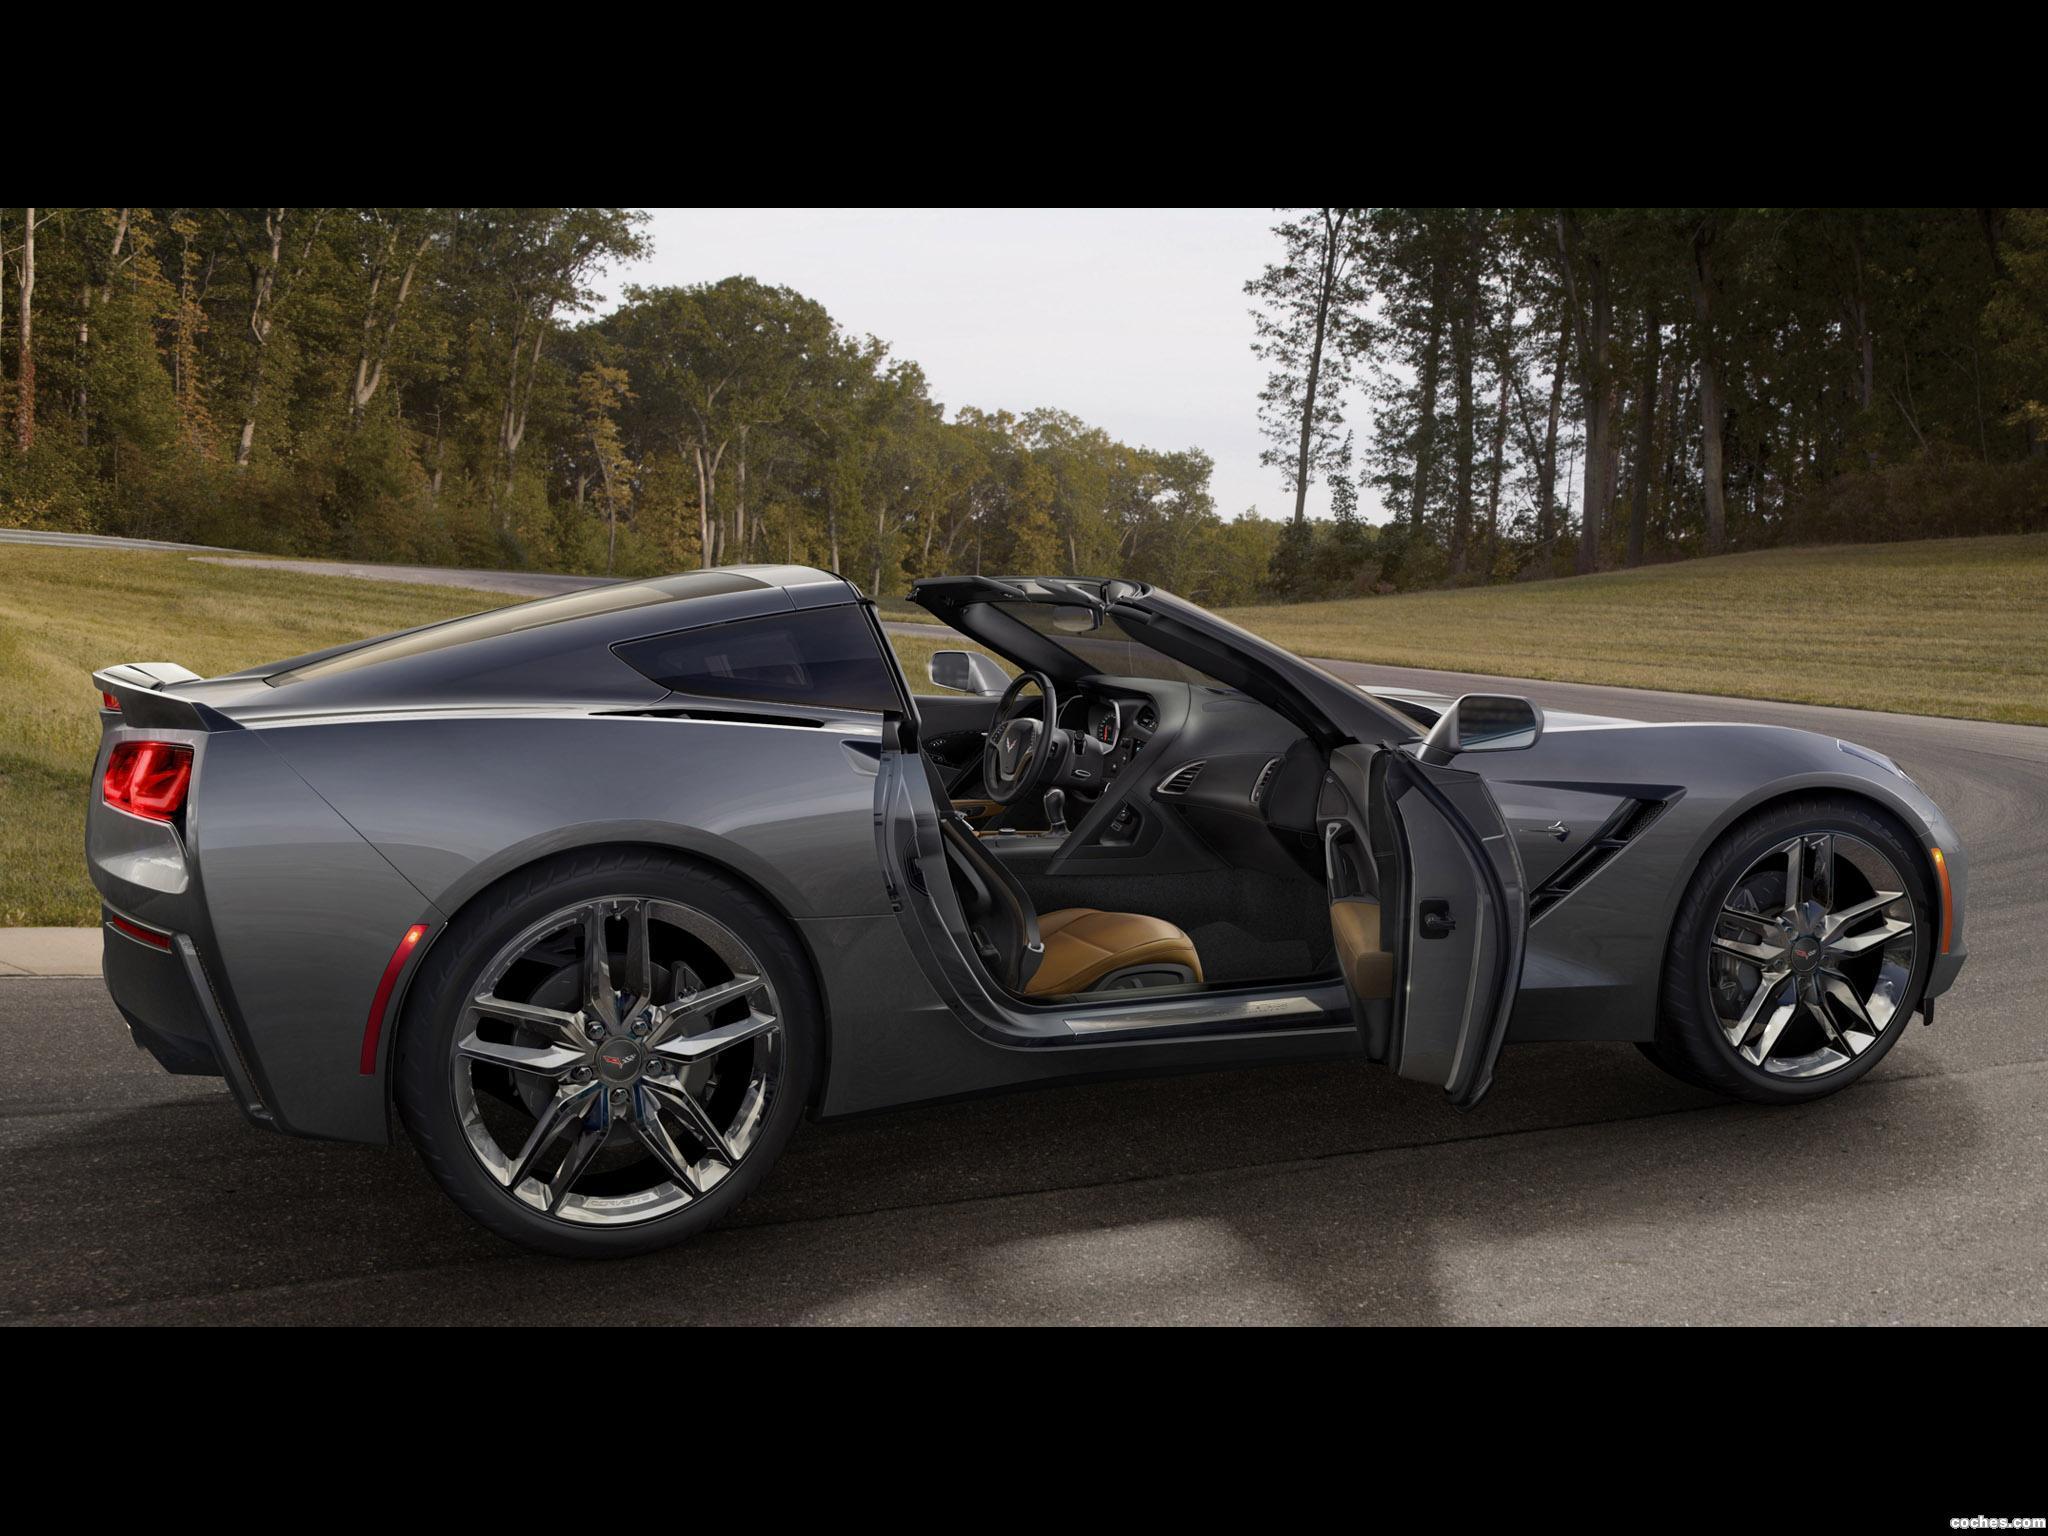 Foto 17 de Chevrolet Corvette Stingray C7 2014